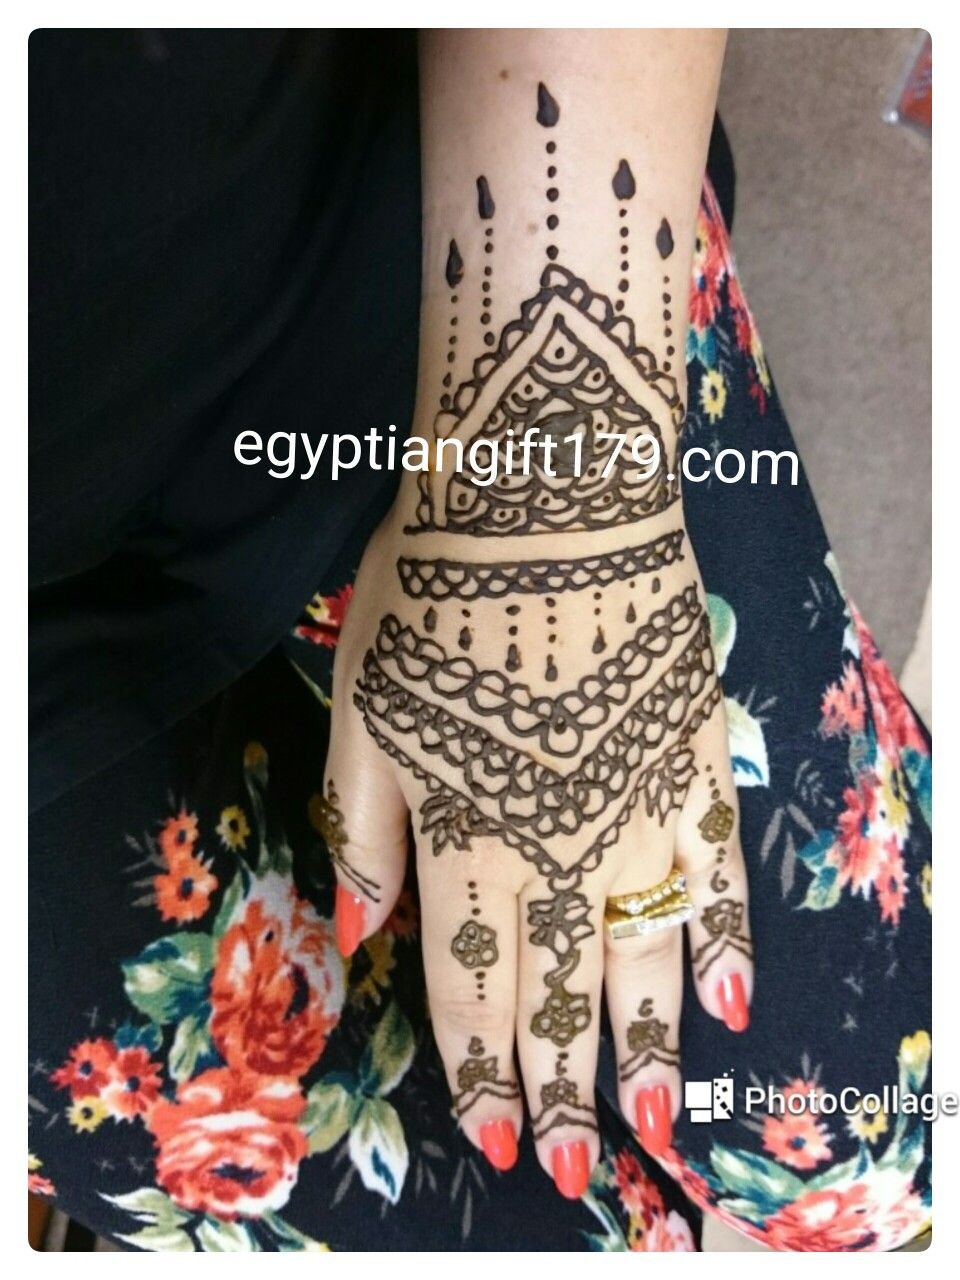 Egyptian gift corner henna shop henna henna kit